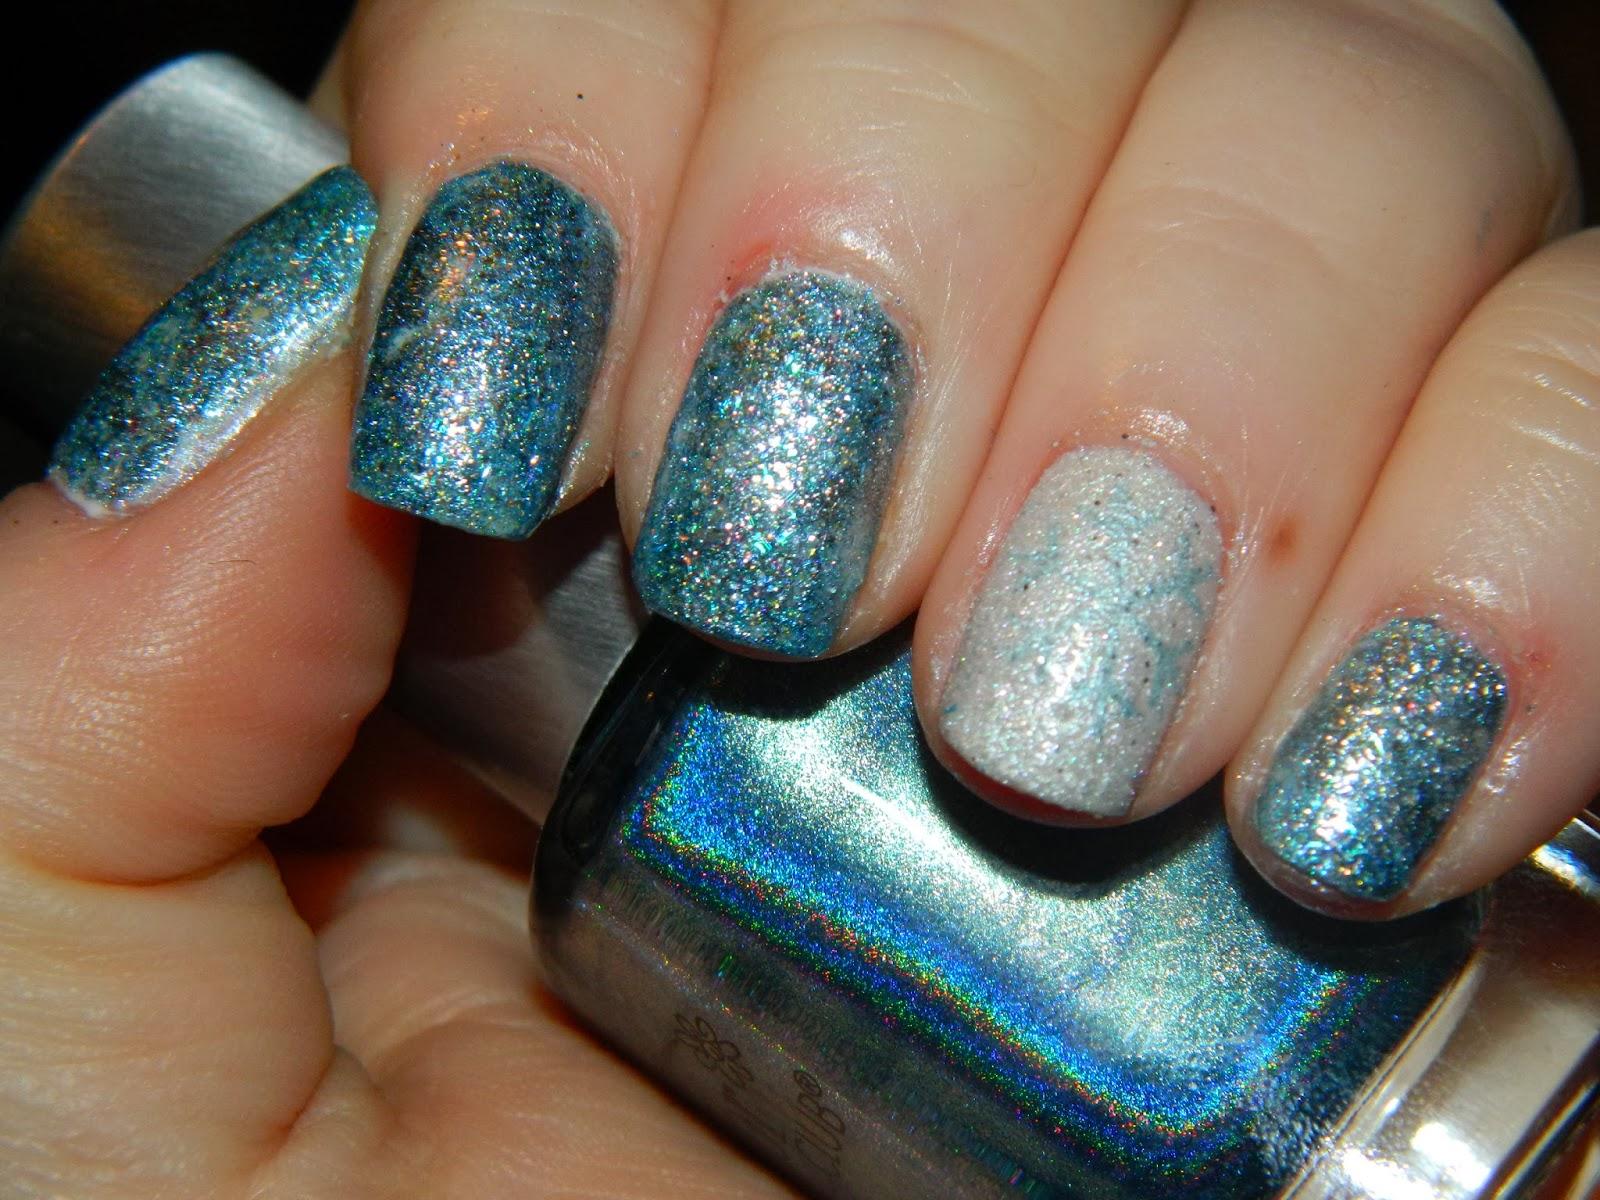 sassy swatches: Frozen Inspired Nail Art